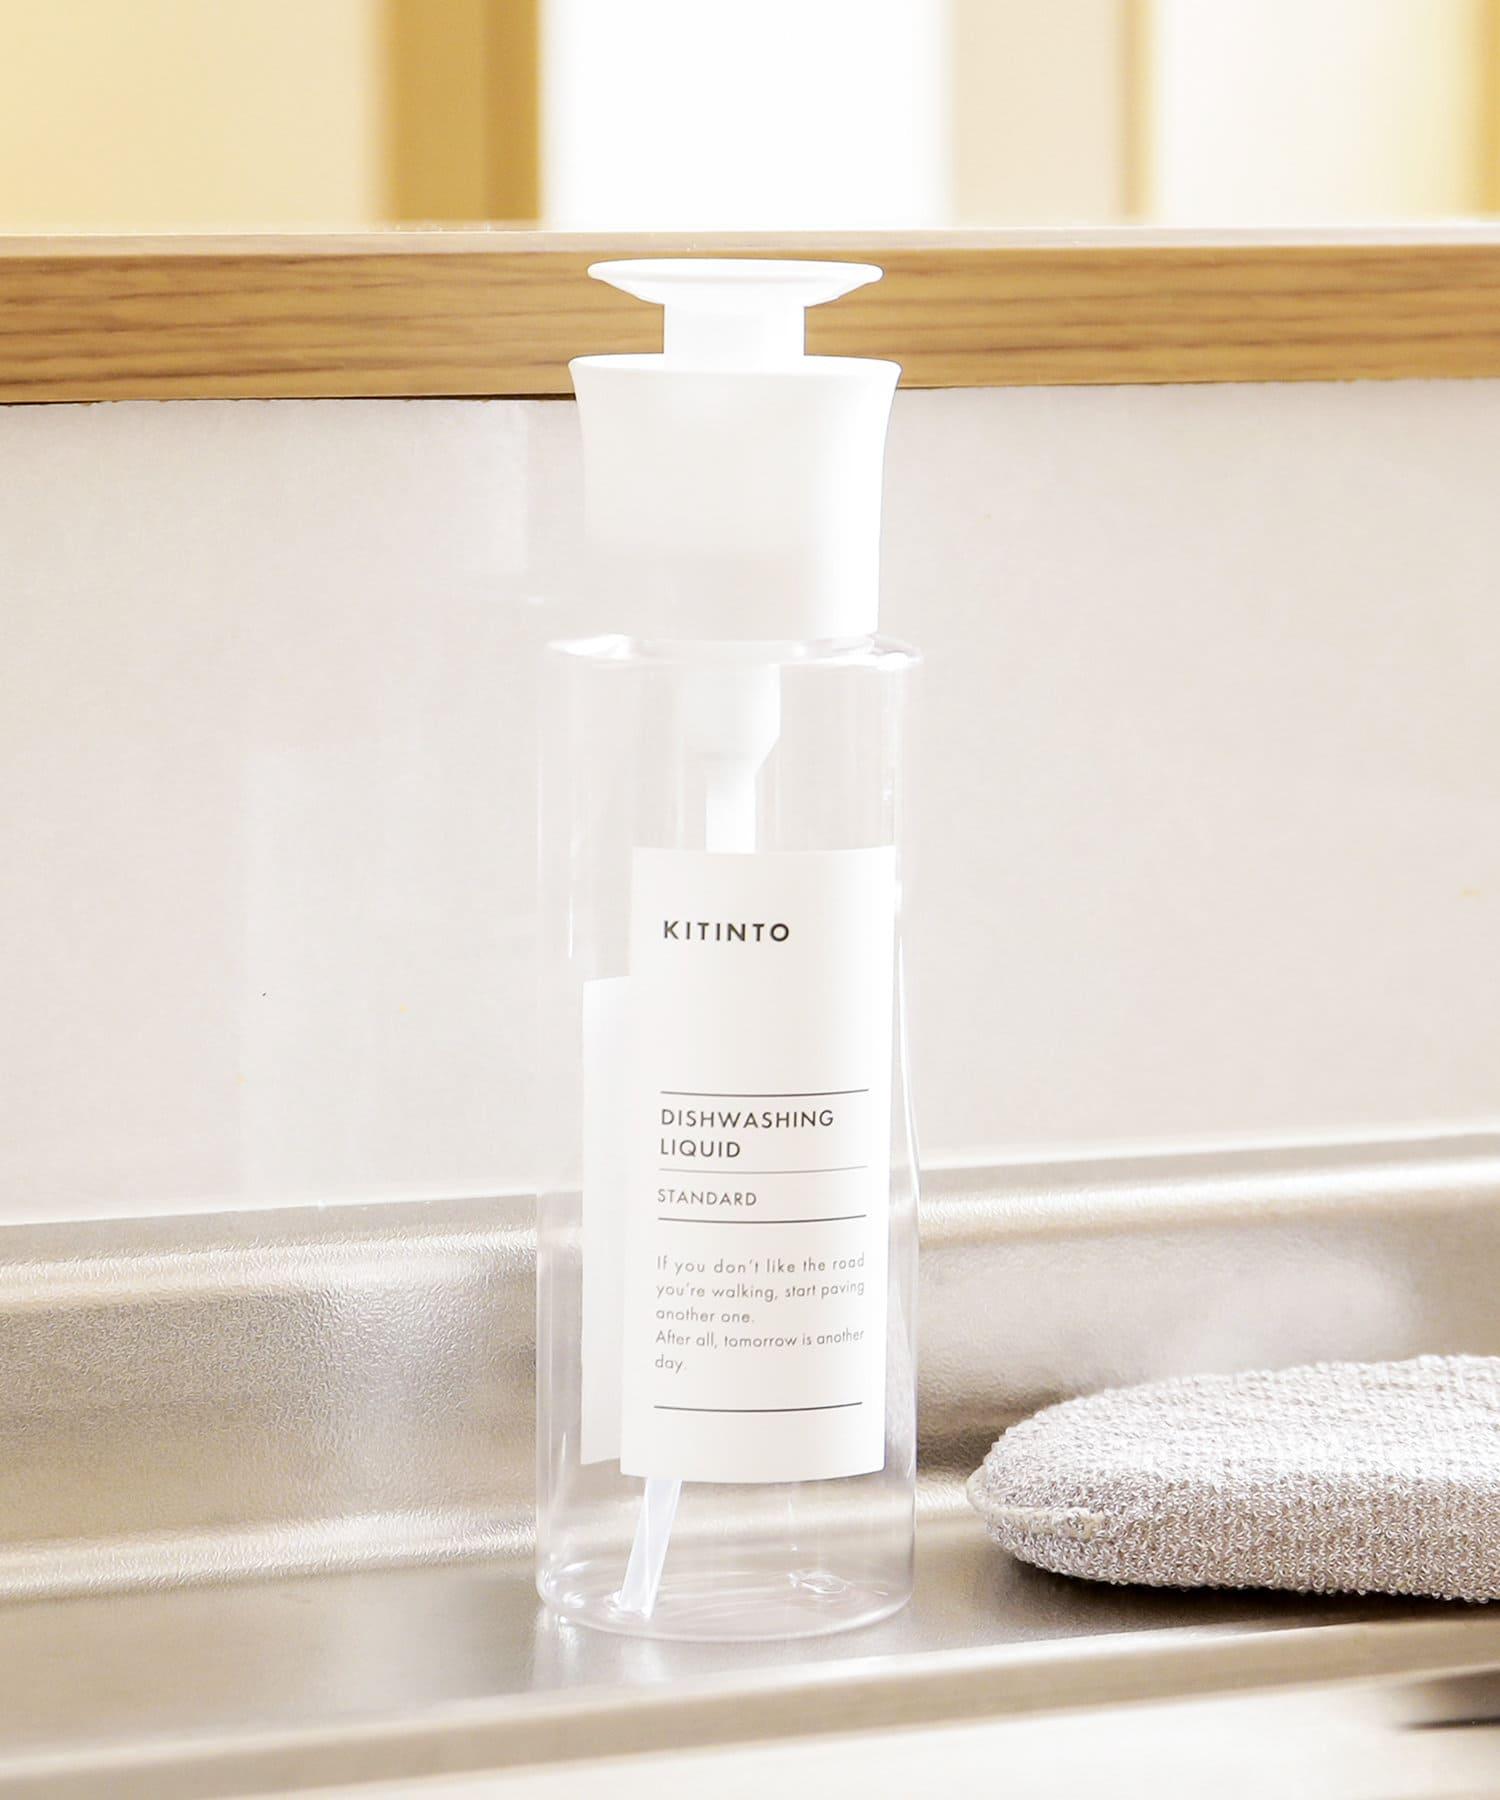 3COINS(スリーコインズ) 【キッチン用品ベストセラー】食器洗剤ボトル